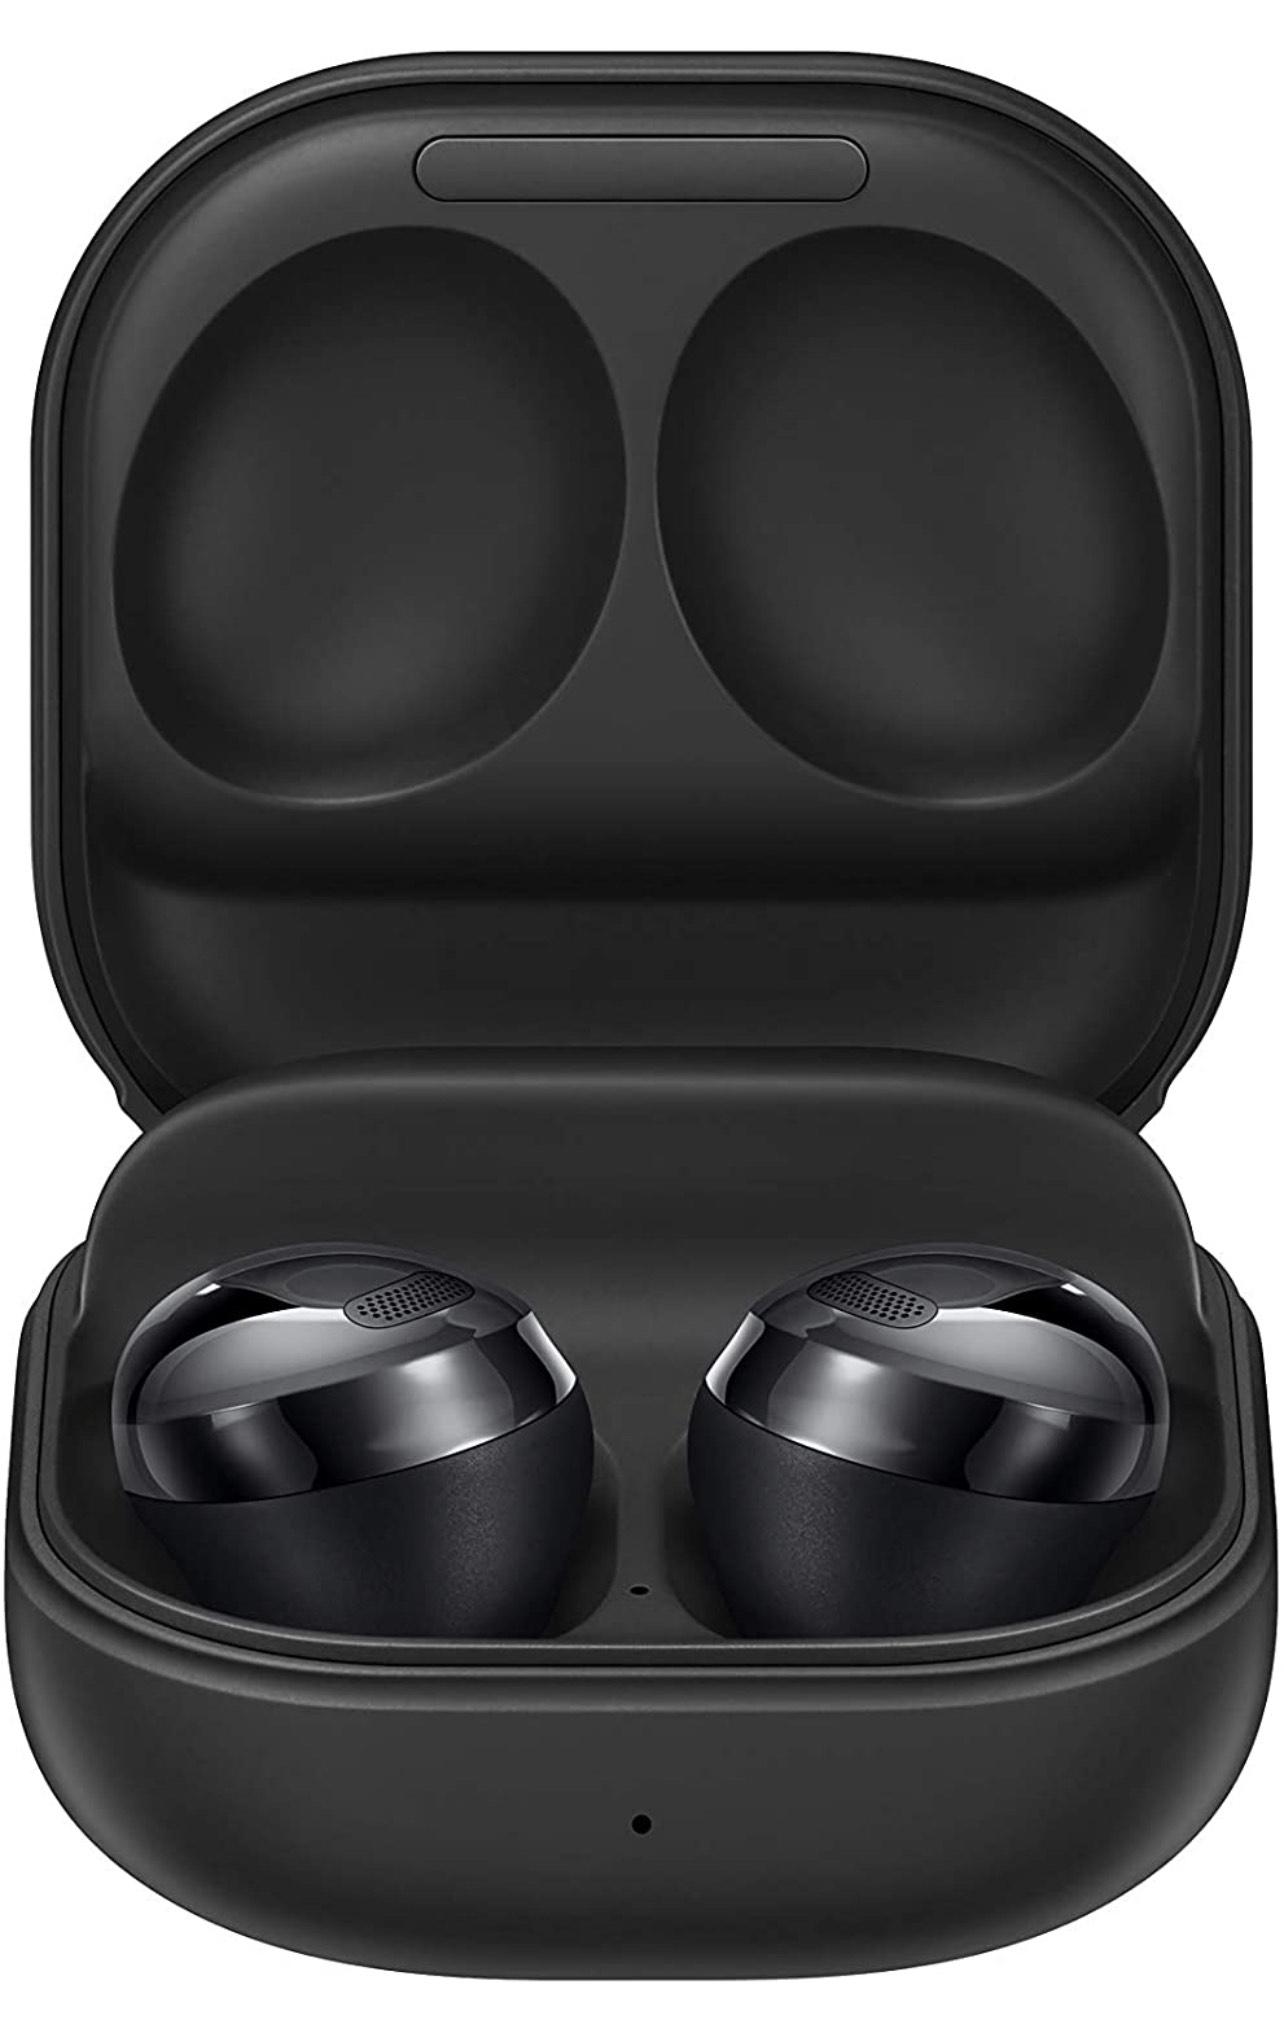 Samsung Galaxy Buds Pro Wireless Headphones - All Colours - £149 @ Amazon